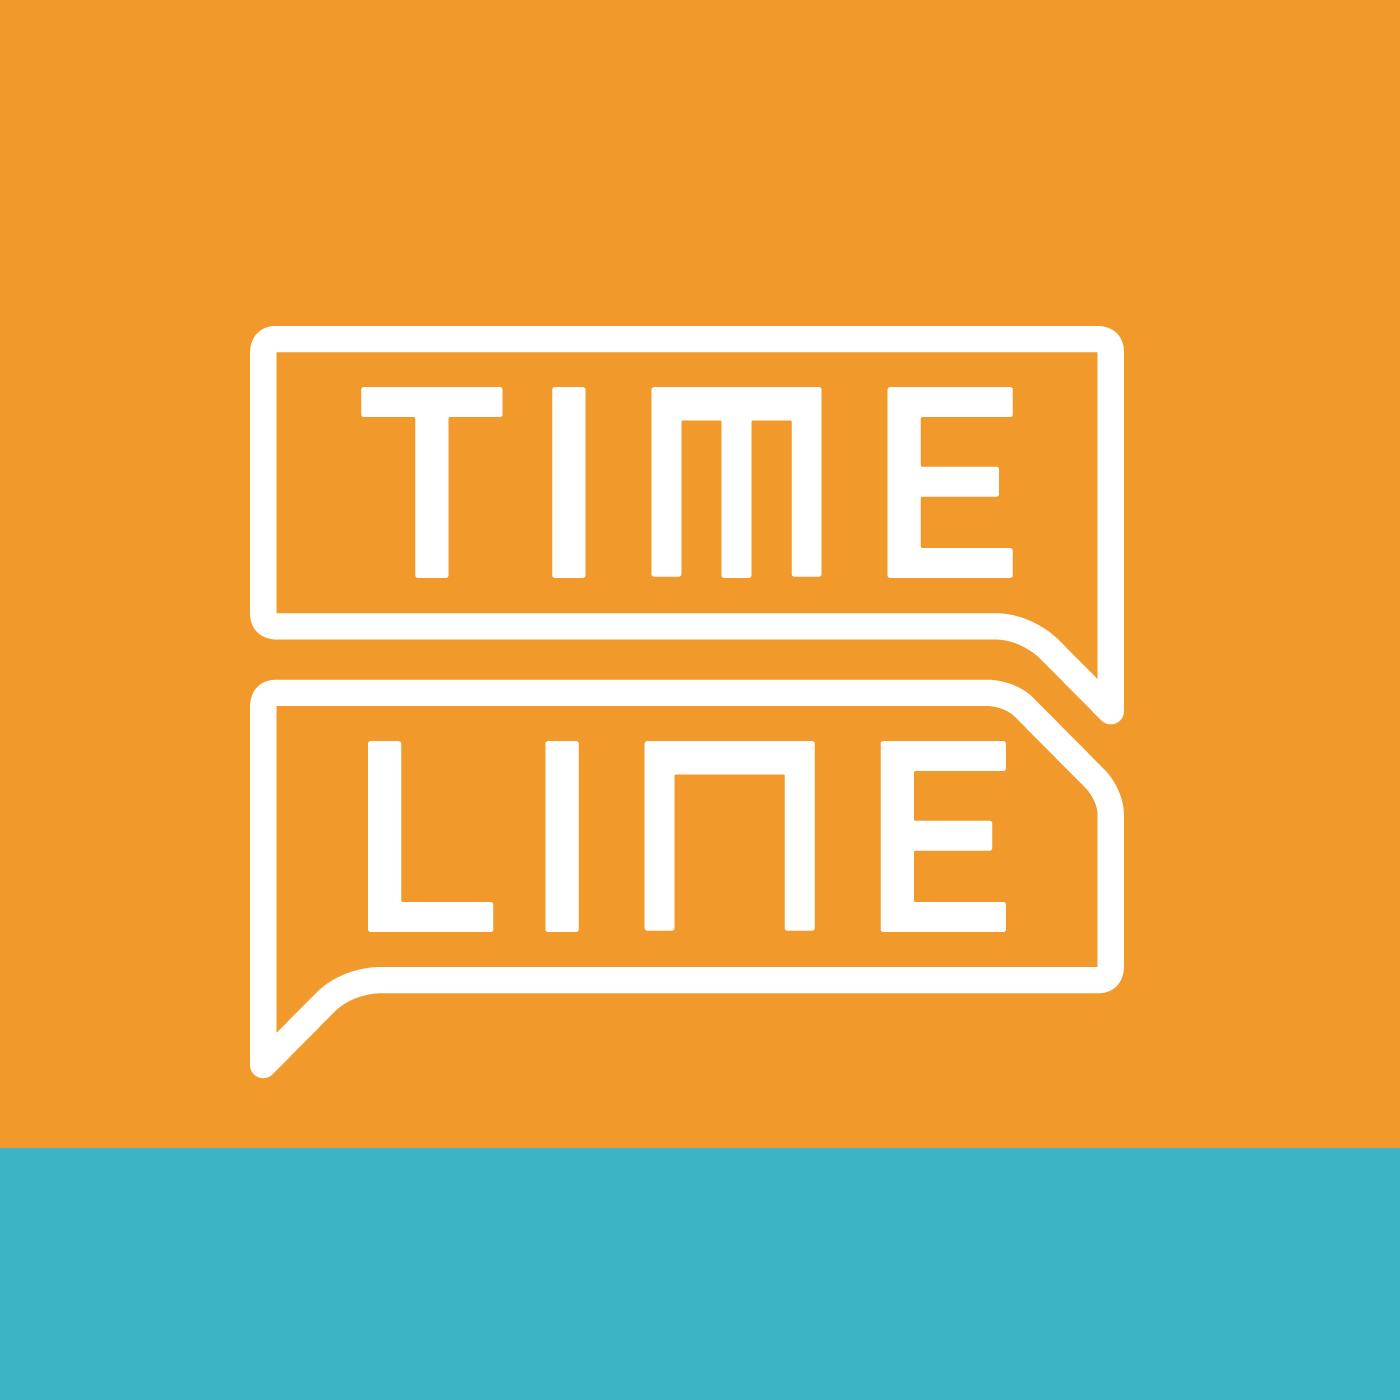 Timeline Gaúcha 26/09/2017